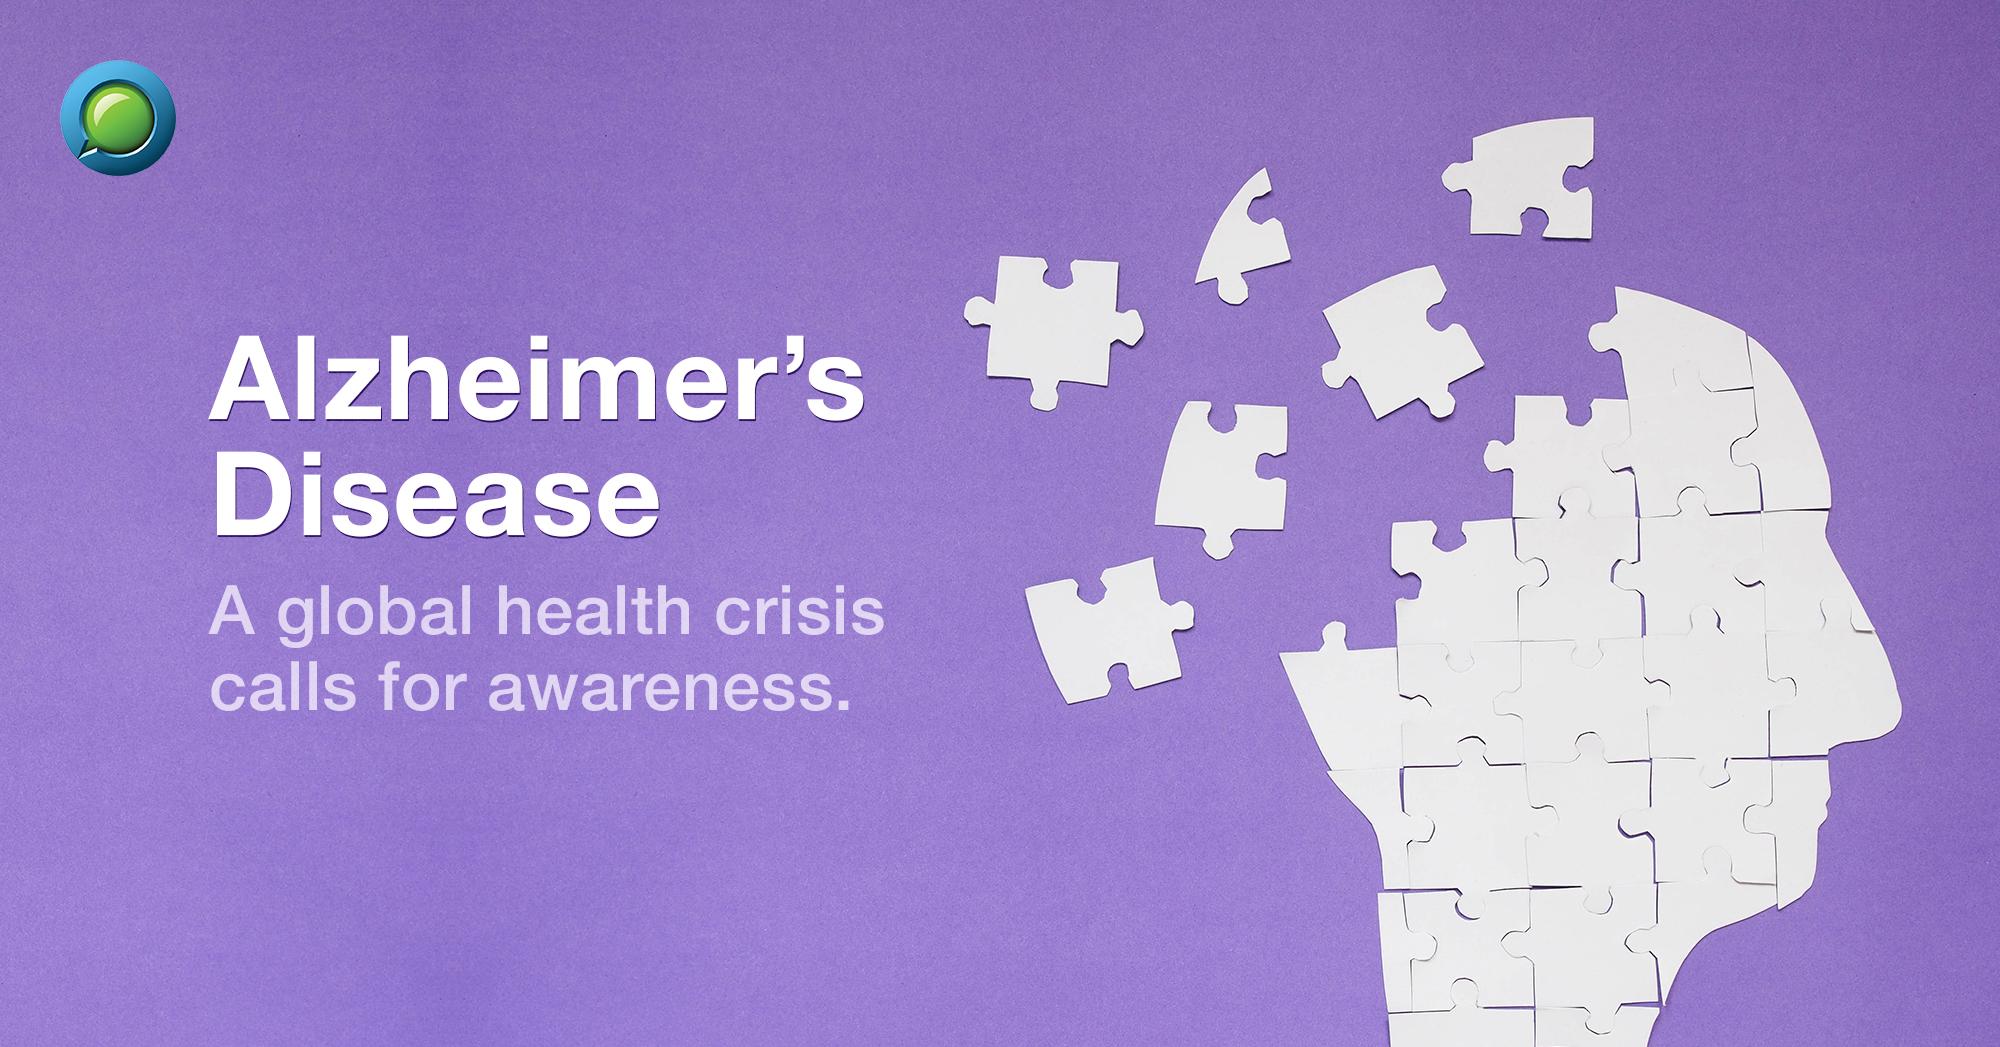 Alzheimer's Disease: A global health crisis calls for awareness